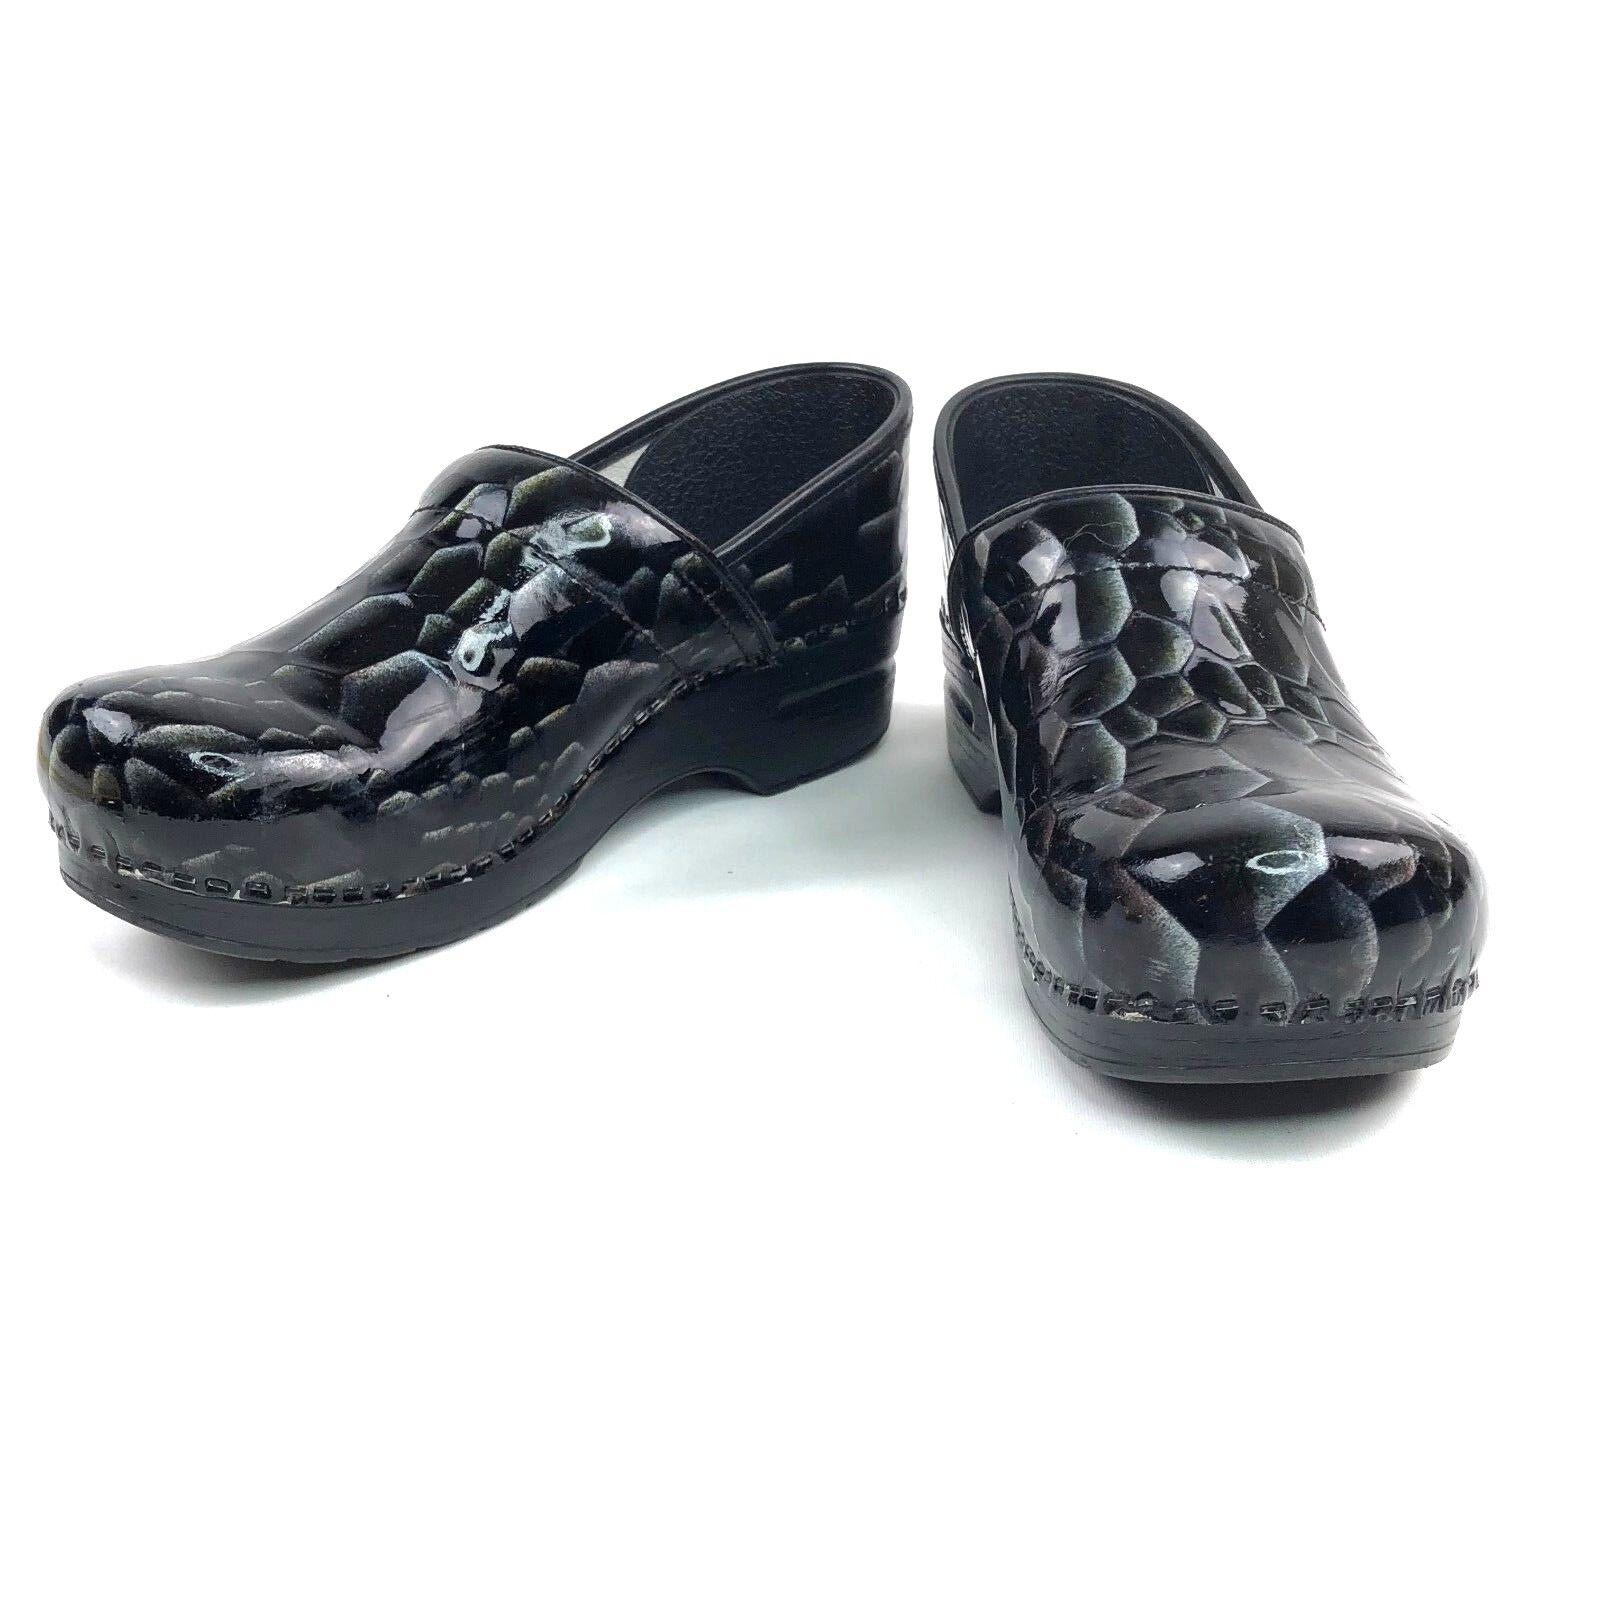 Dansko Professional Patent Leather Clogs Größe 40